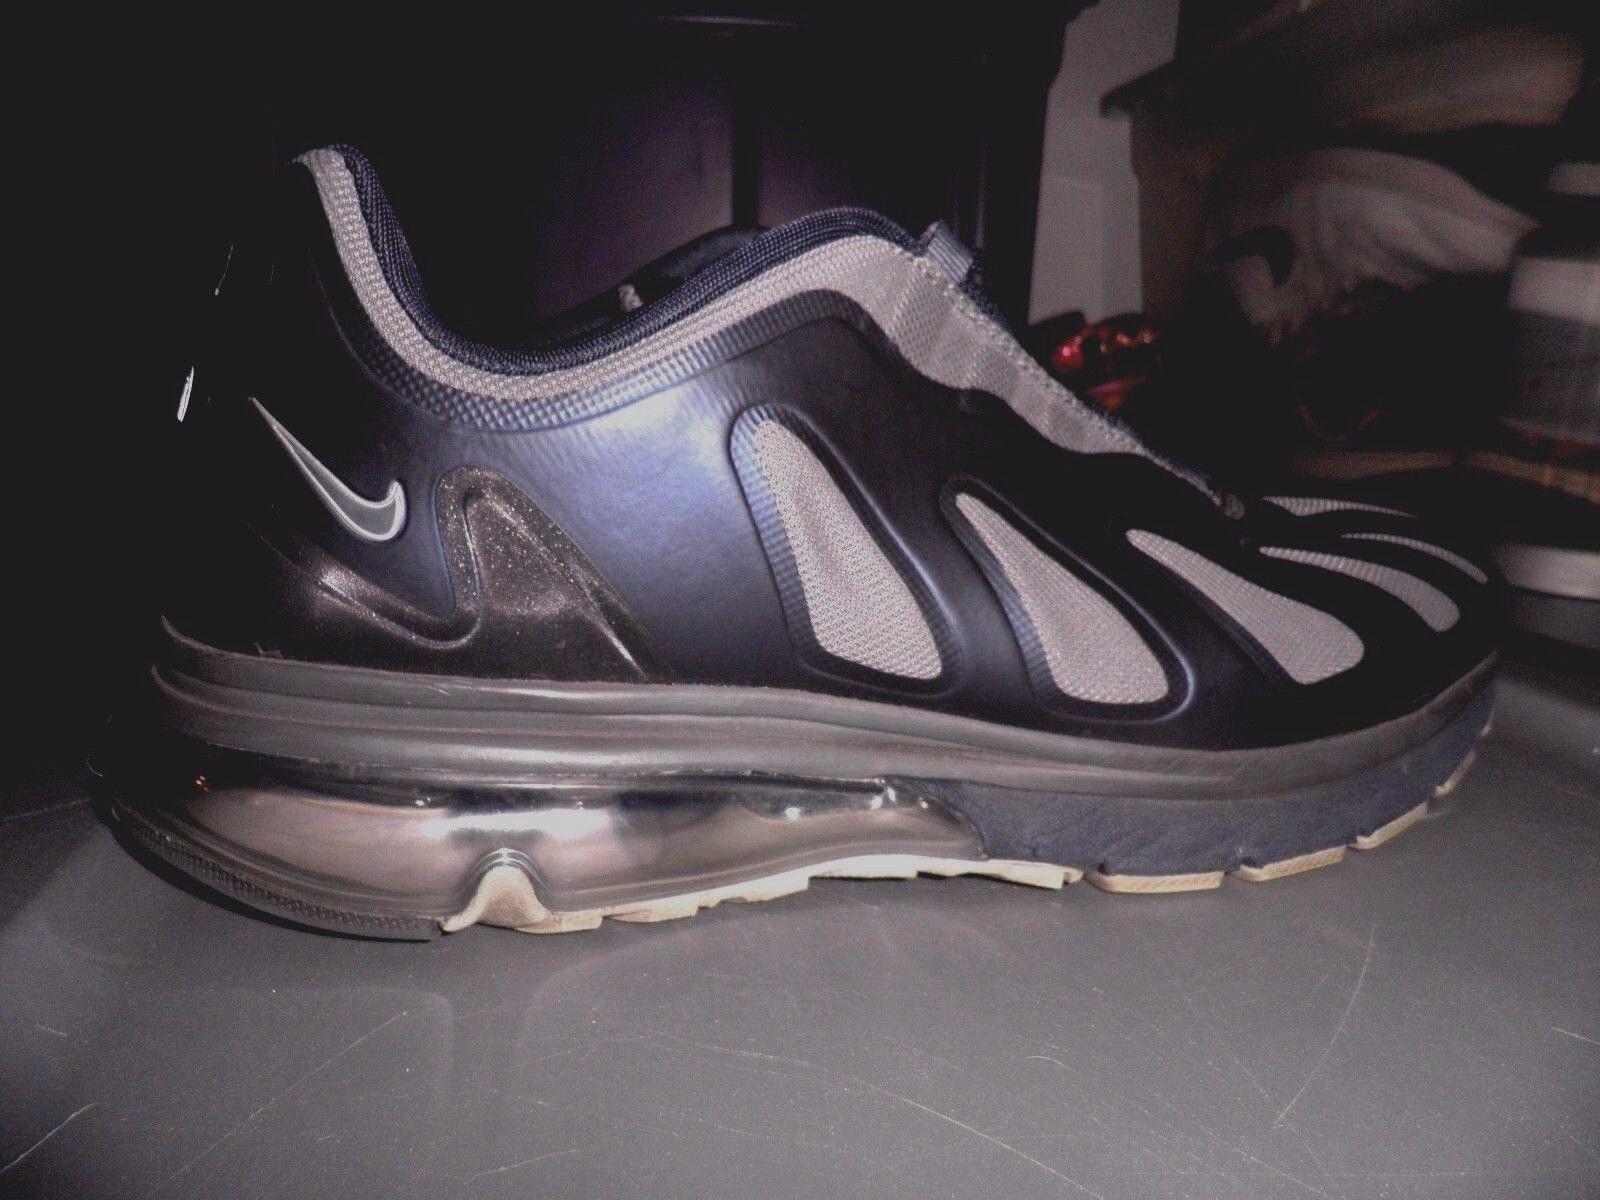 Nike Air Max 96+ Evolve Size 13 Obsidian Dark Grey-Metallic Silver-Metallic